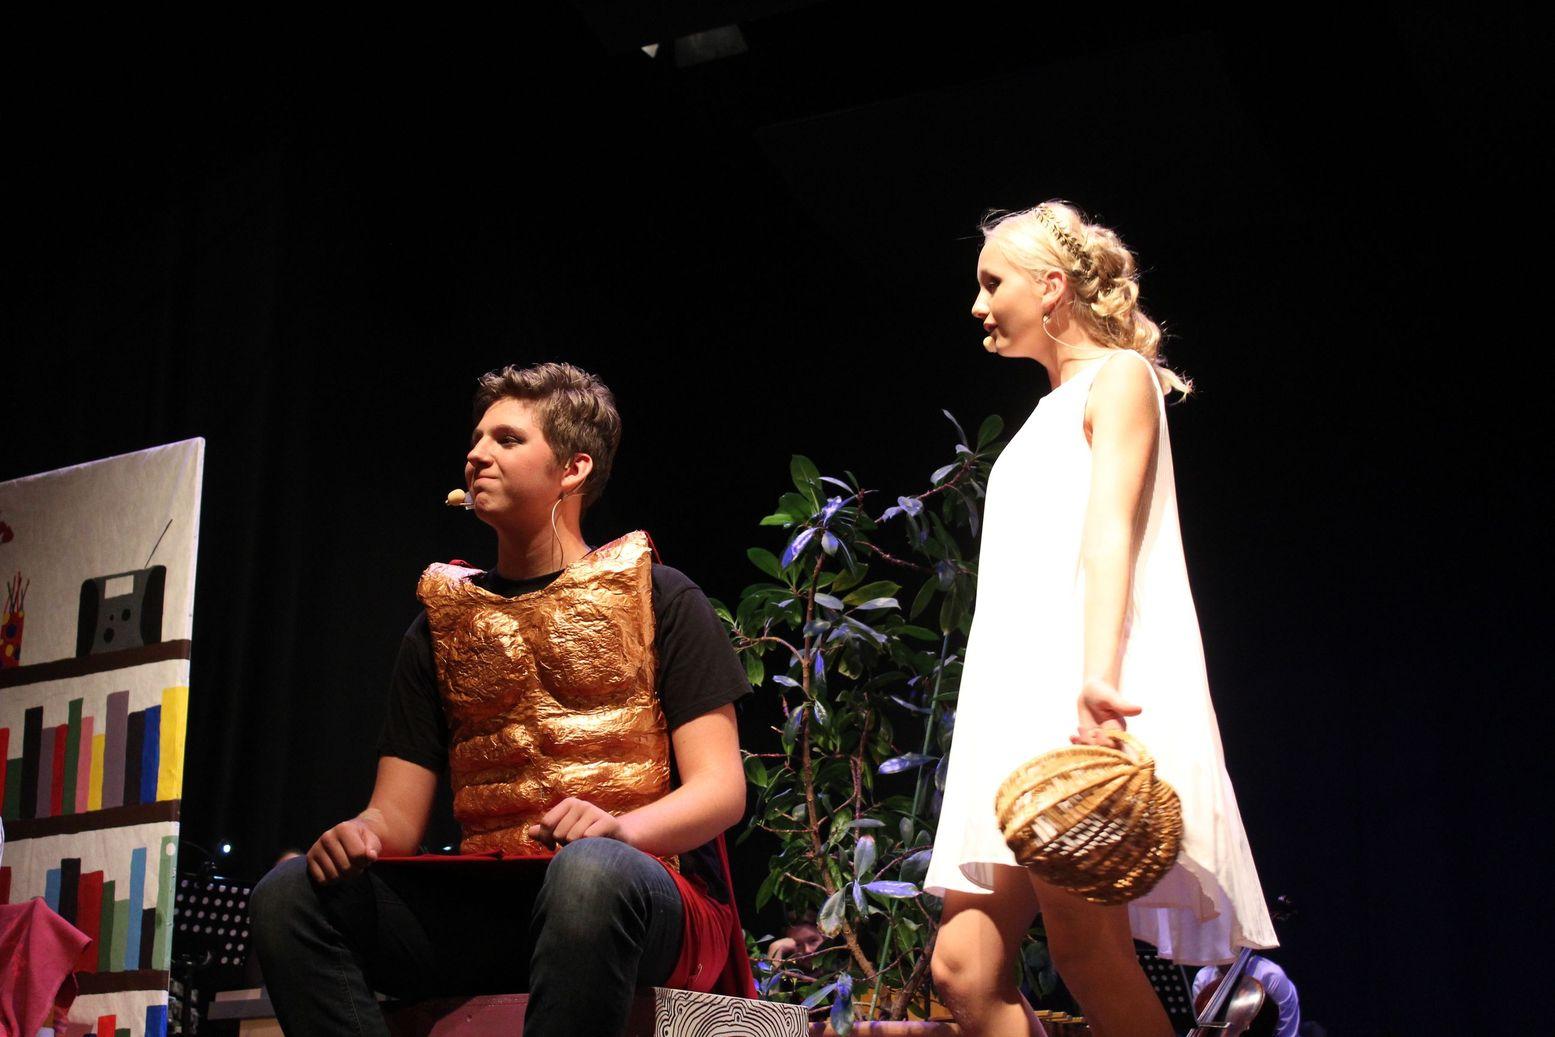 Odysseus29